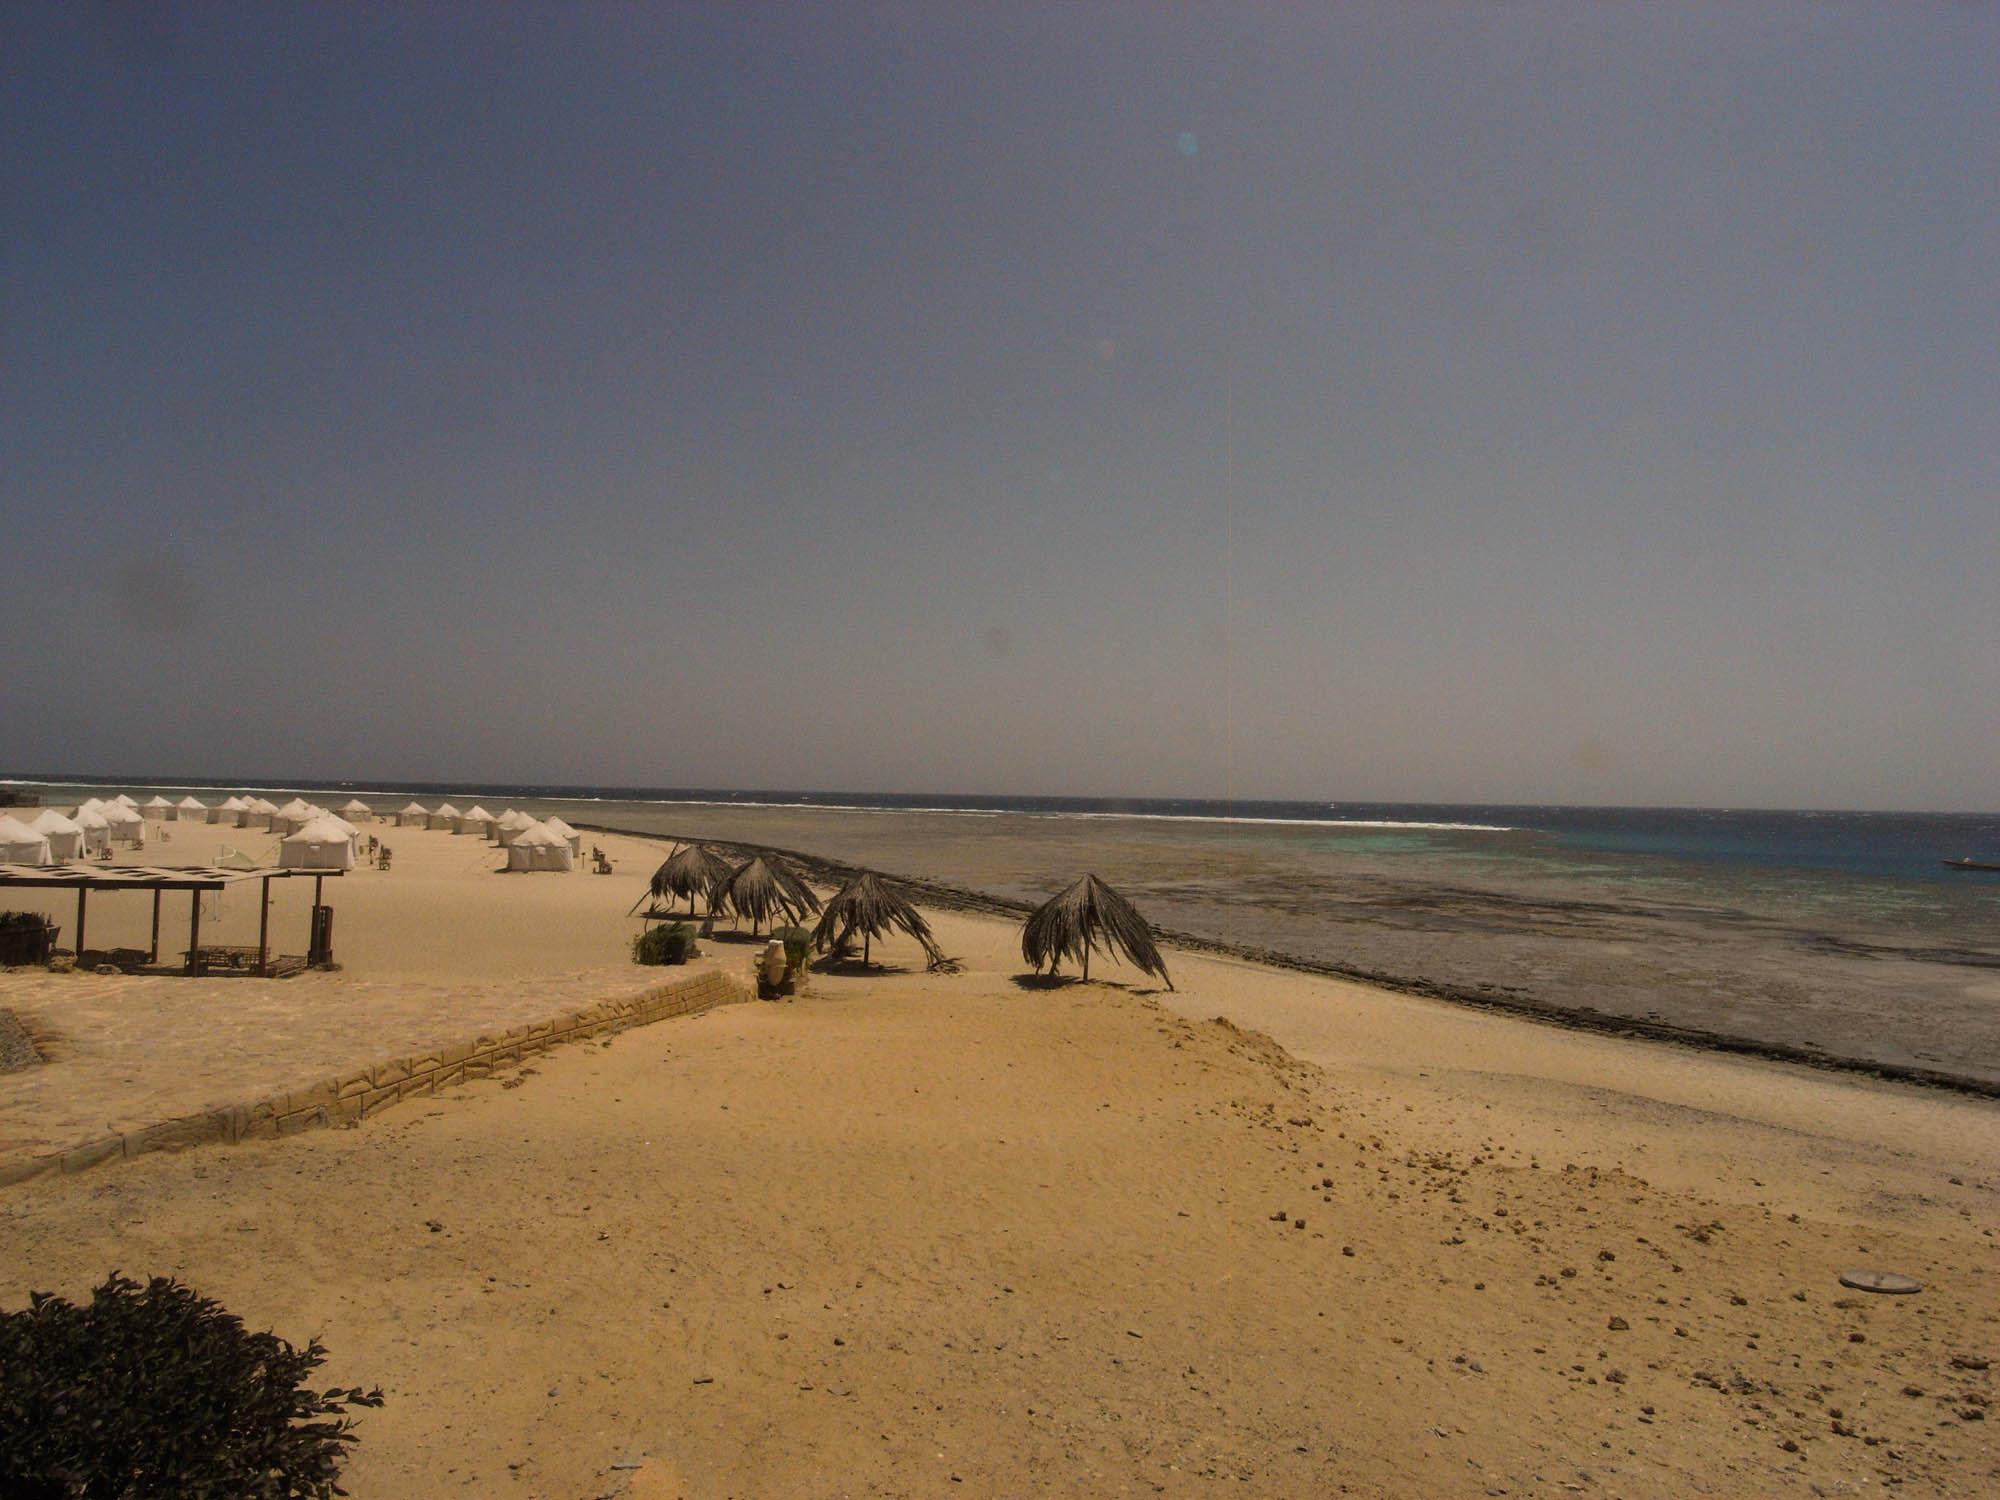 Marsa_Shagra_Red Sea Diving Safari_Tauchen_Rotes_Meer_Ägypten-11